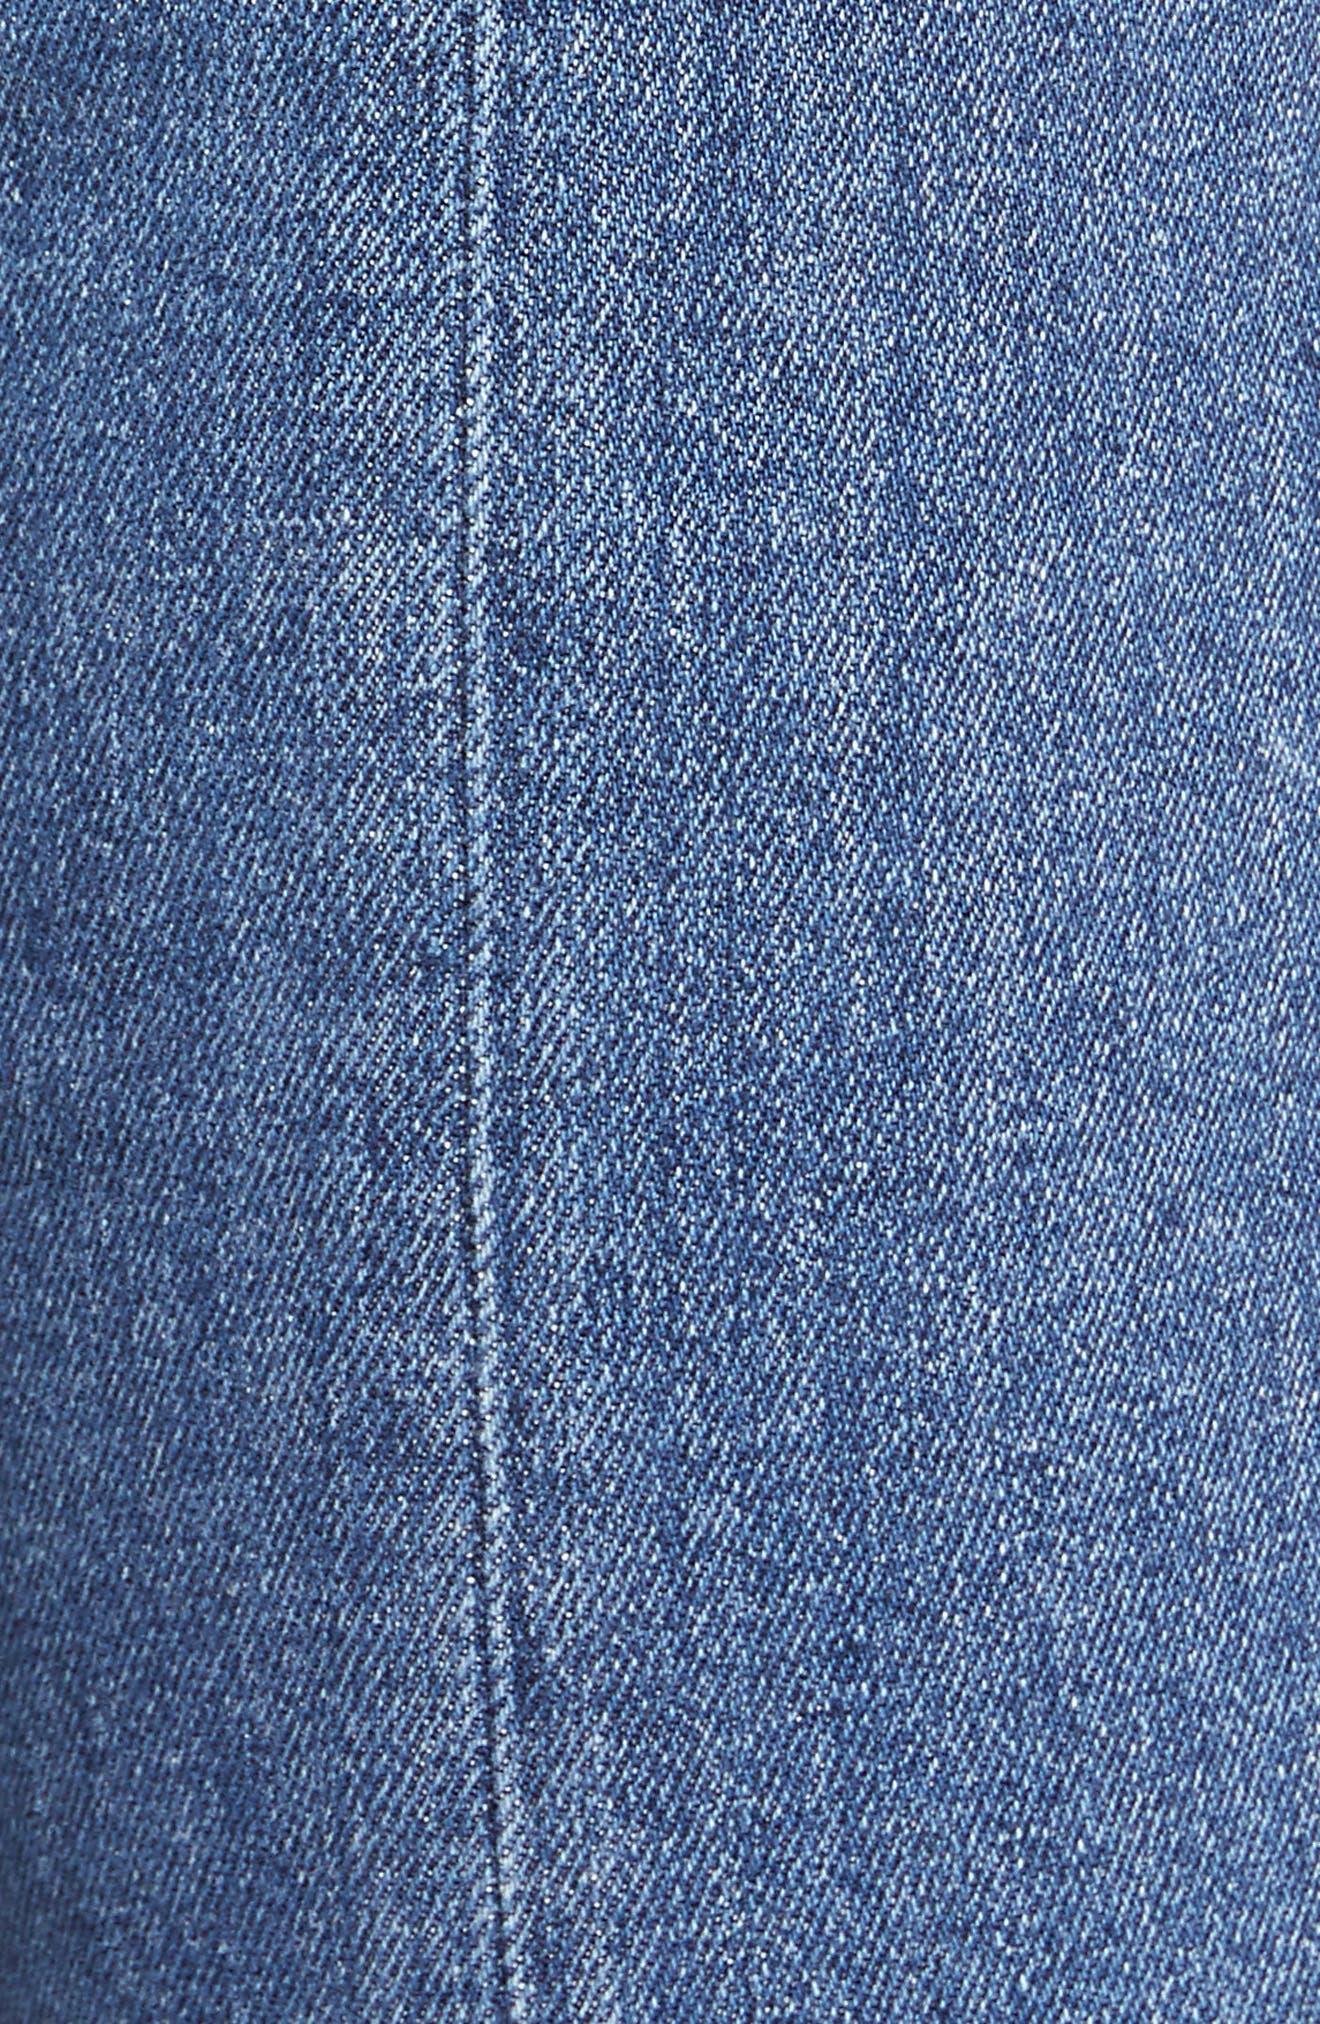 Izzy High Rise Center Seam Slim Jeans,                             Alternate thumbnail 5, color,                             400